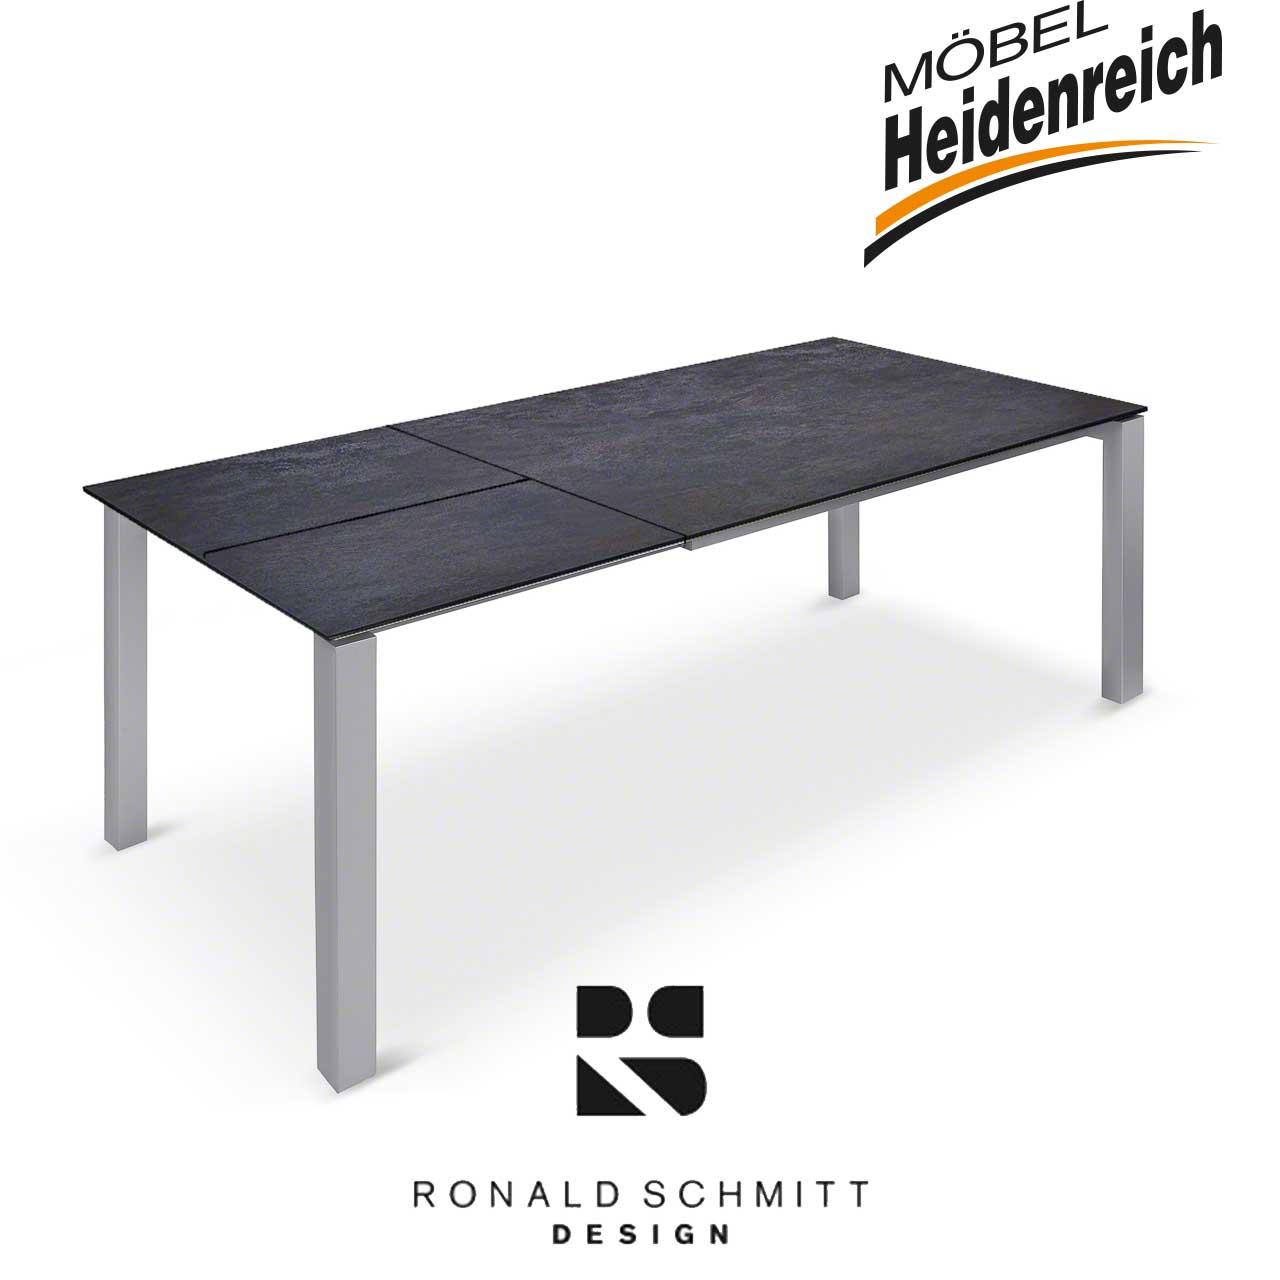 Esstisch P Ausziehbar Keramik Ronald Schmitt 2380 IEHWD29